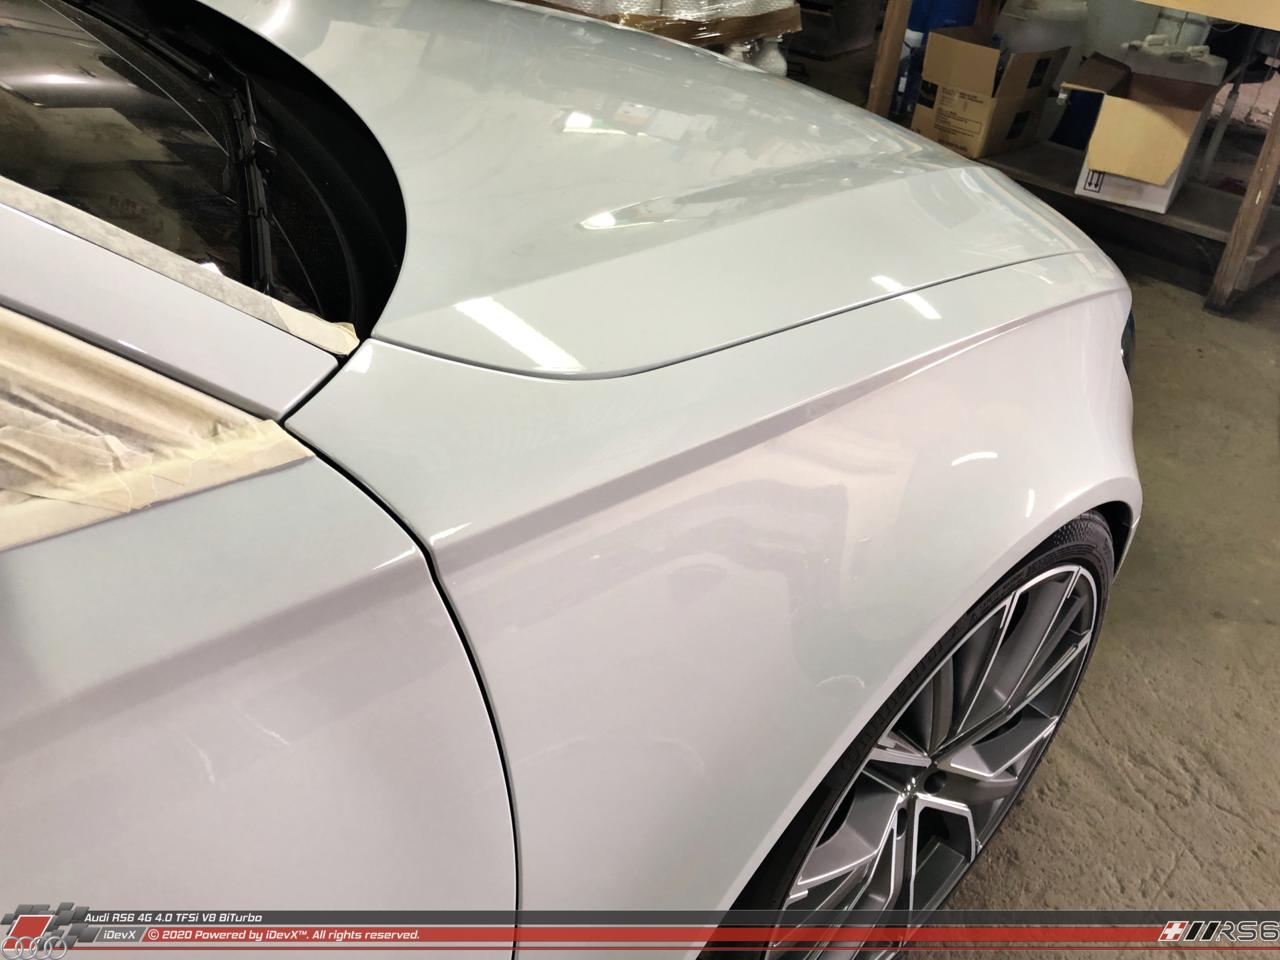 05_08.2019_Audi-RS6_iDevX_031.png